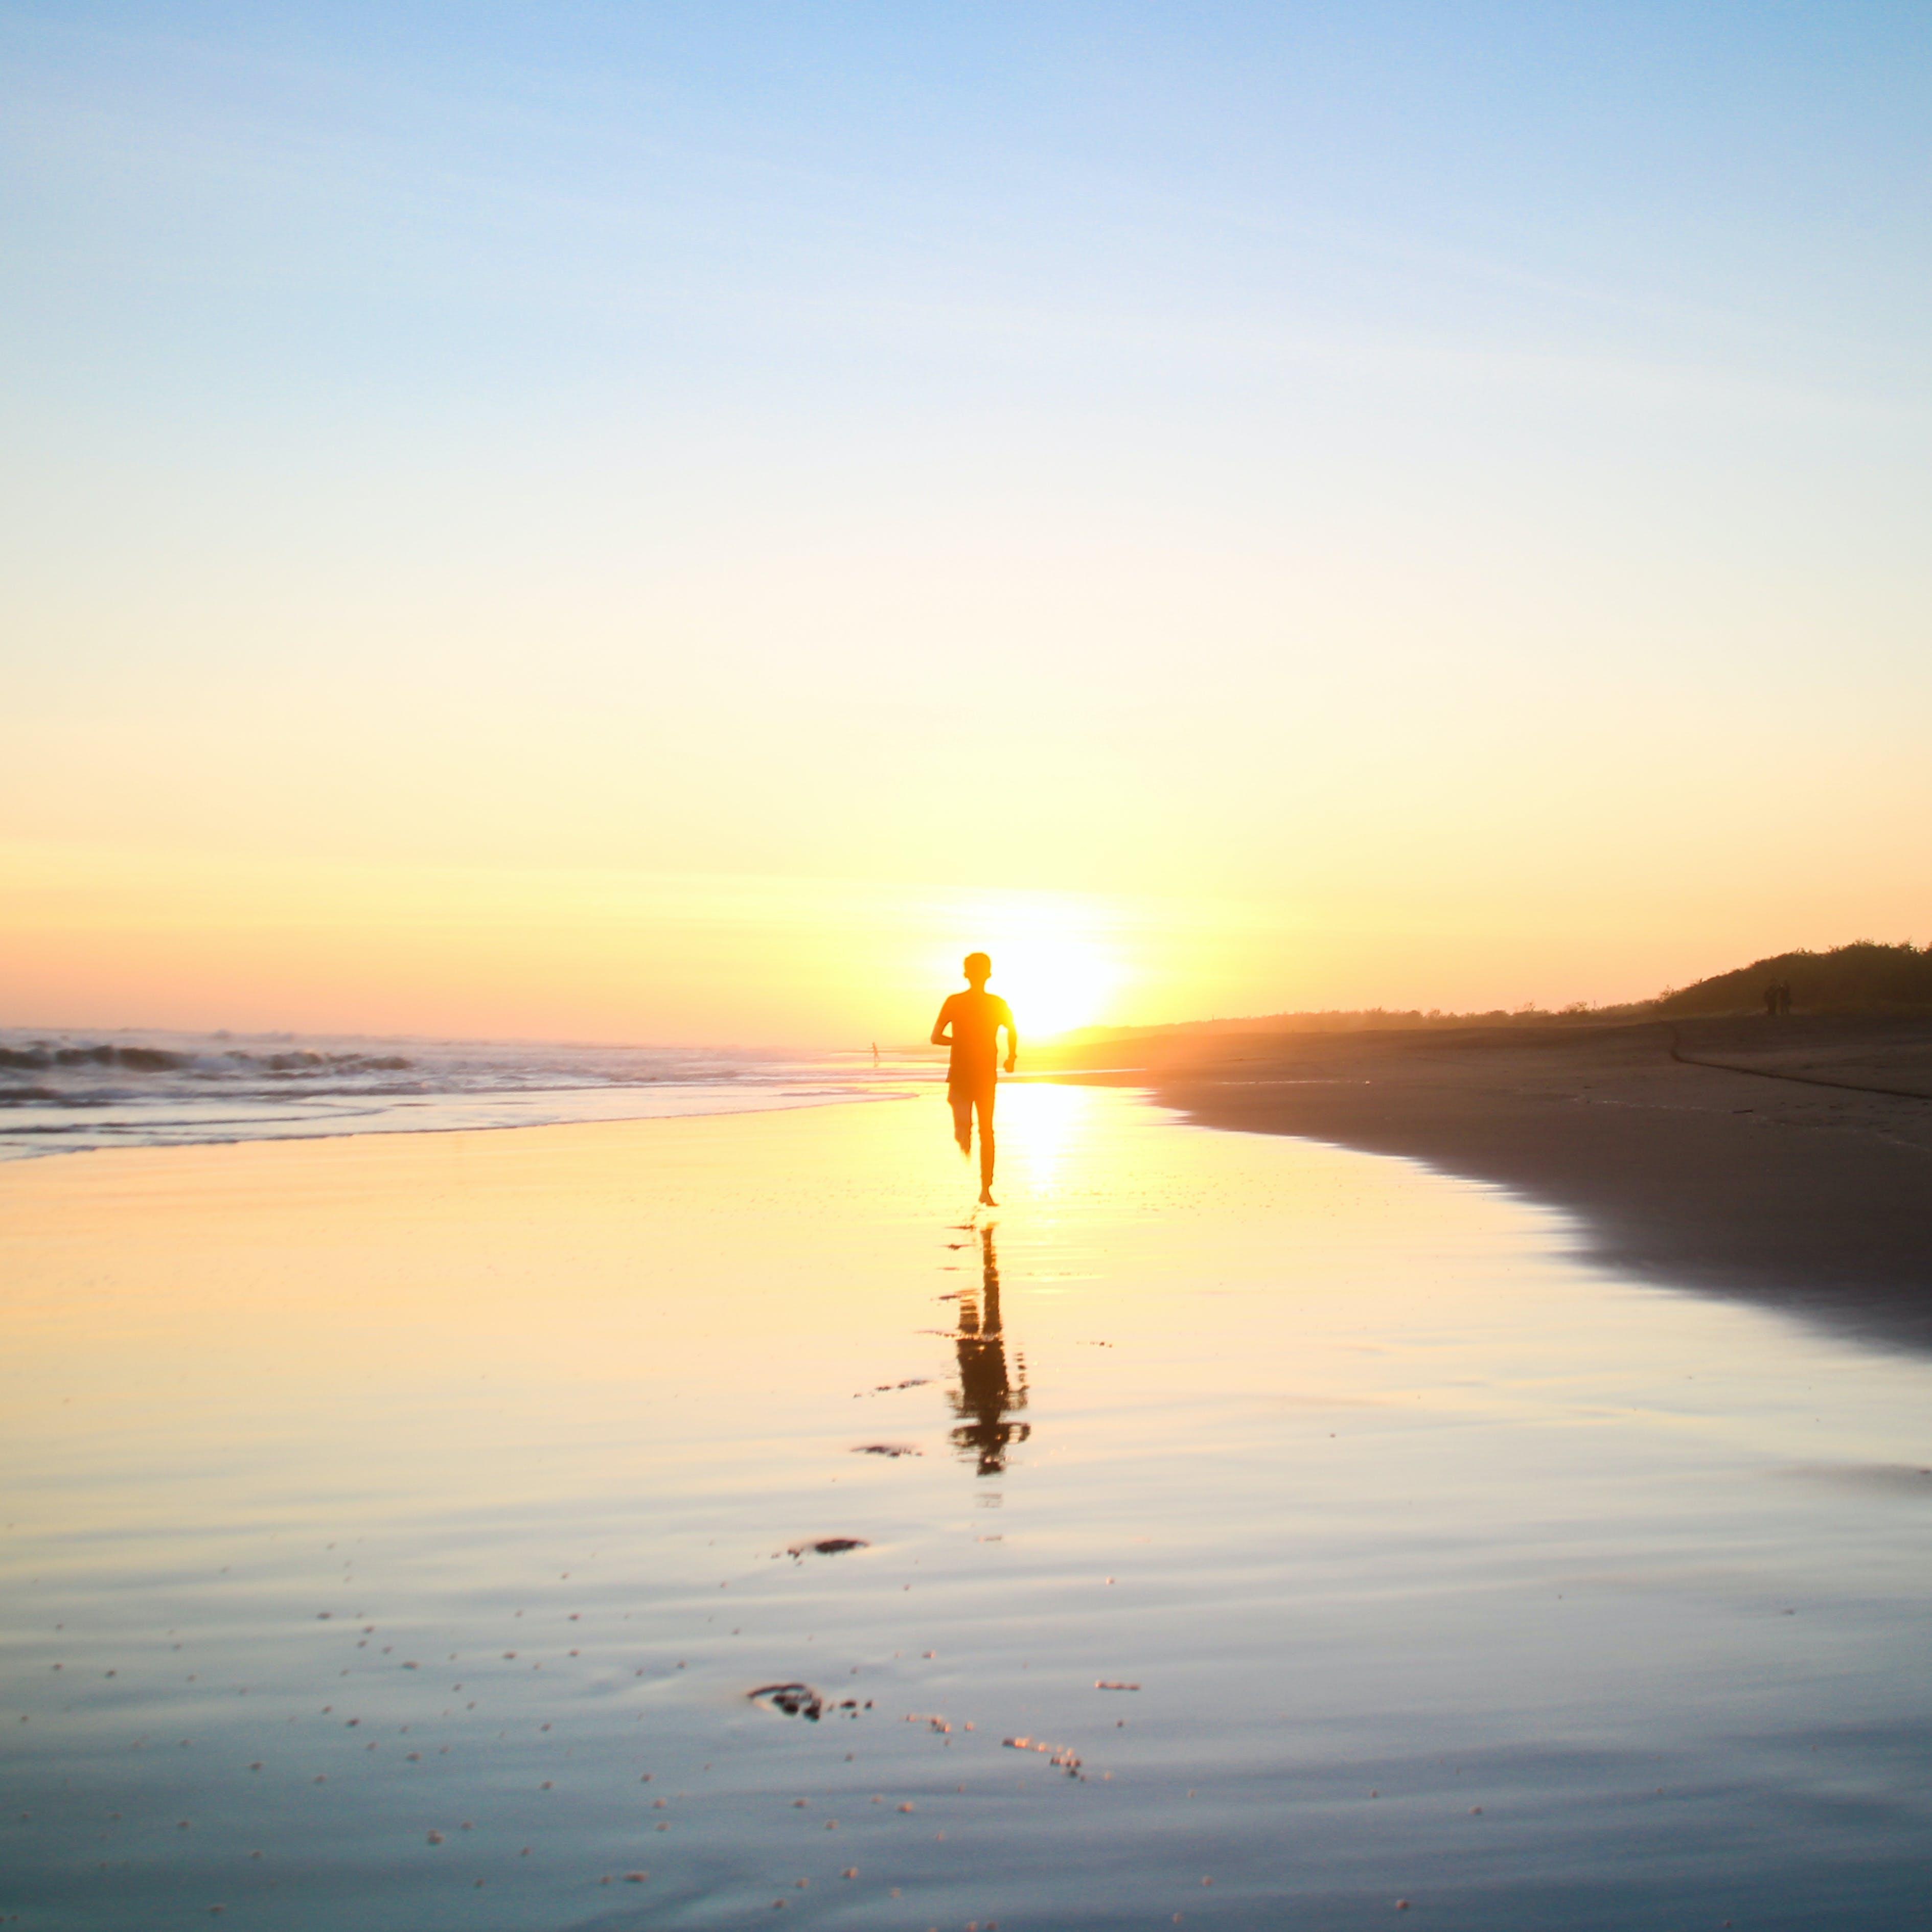 Gratis stockfoto met achtergrondlicht, dageraad, golven, h2o